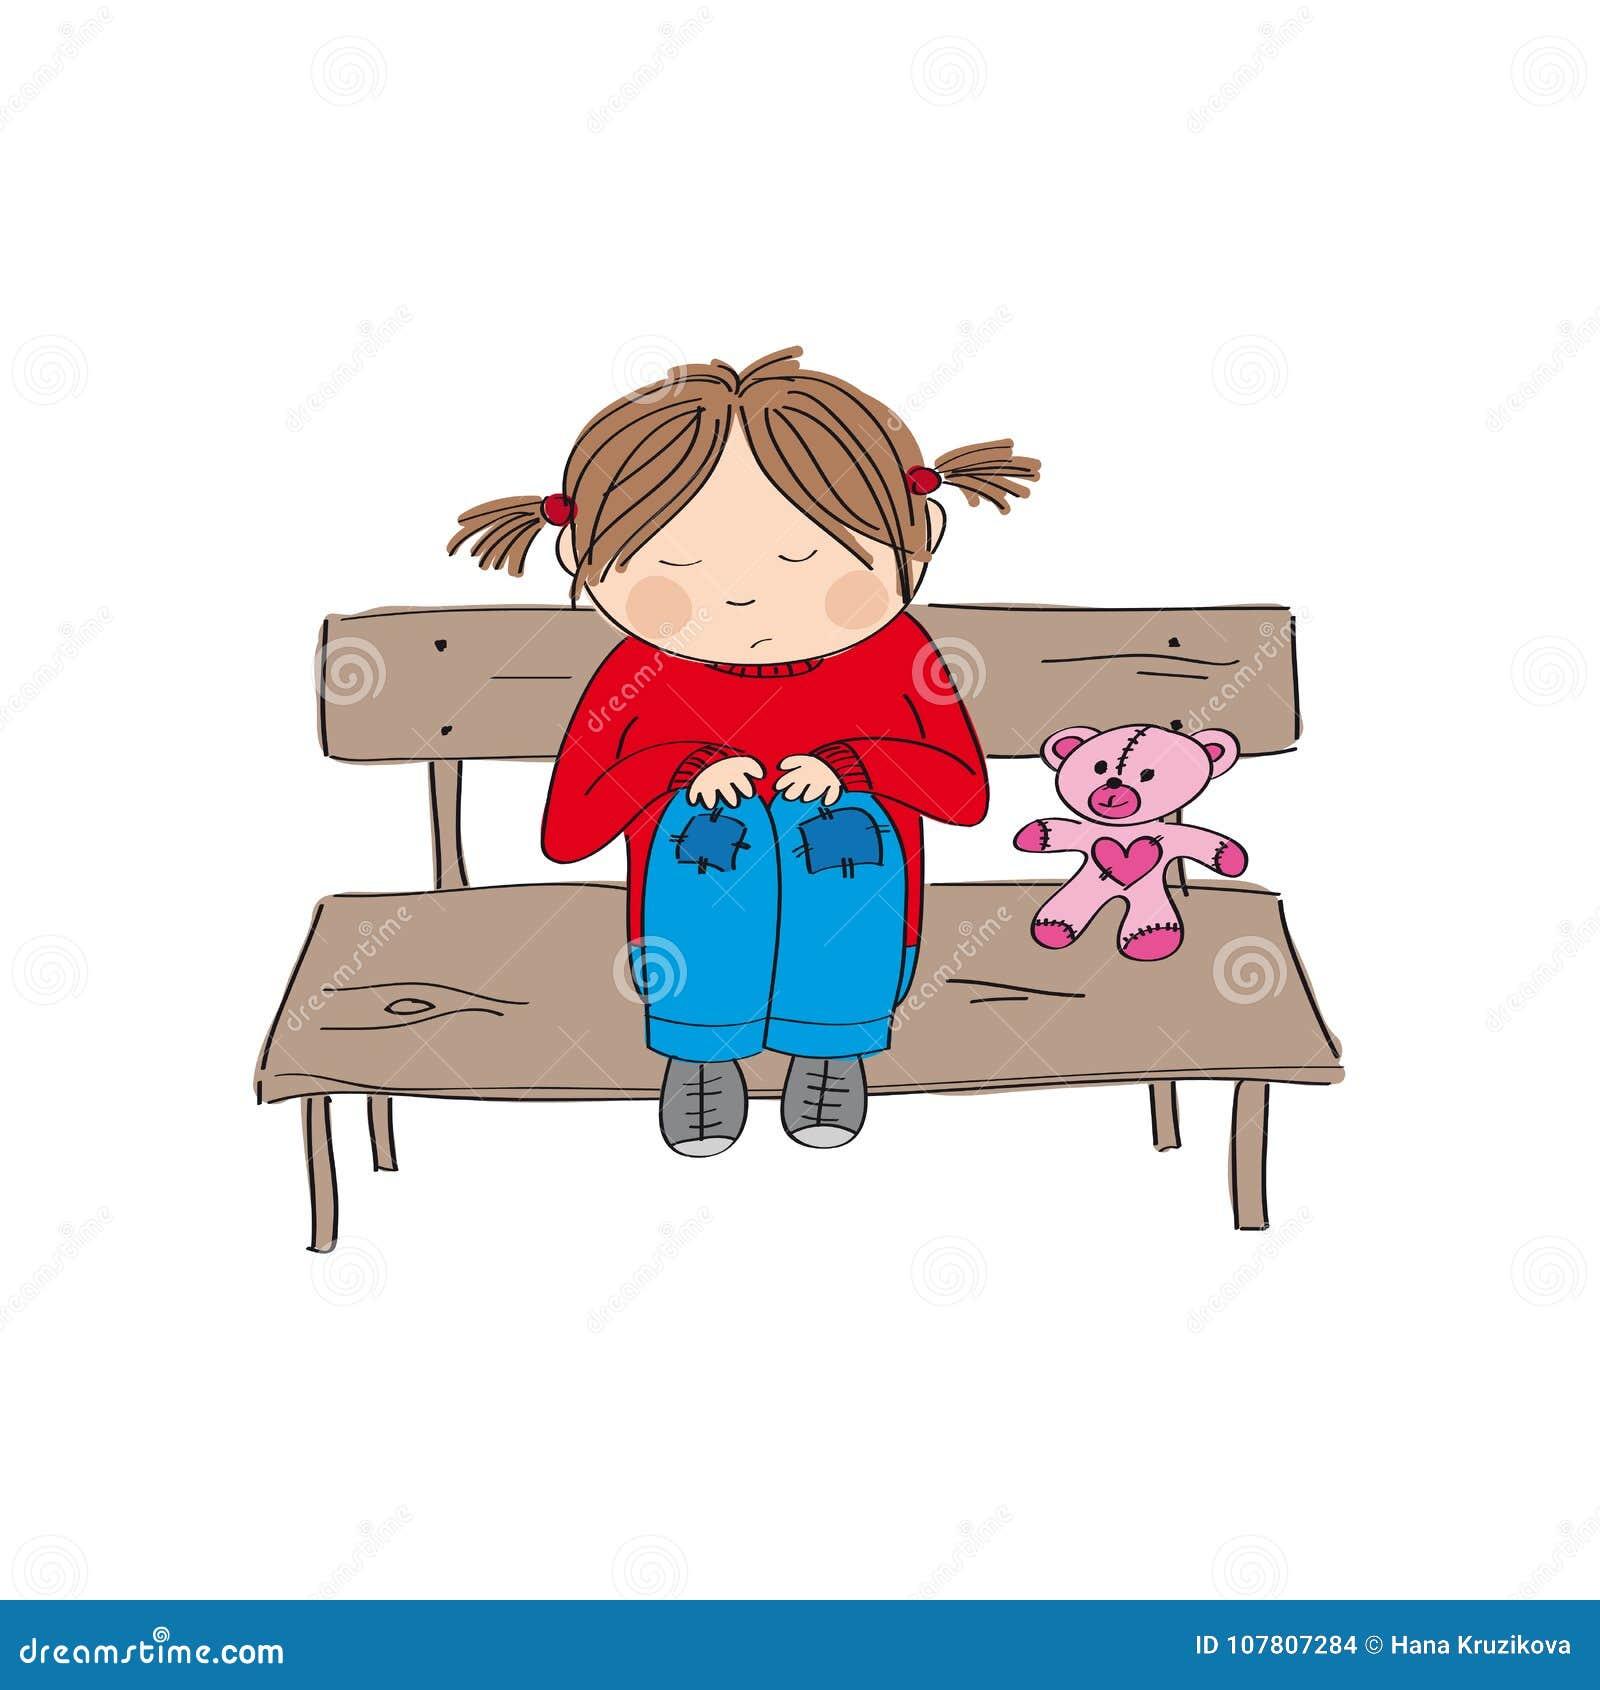 Sad lonely little girl stock illustrations 103 sad - Cartoon girl sitting alone ...